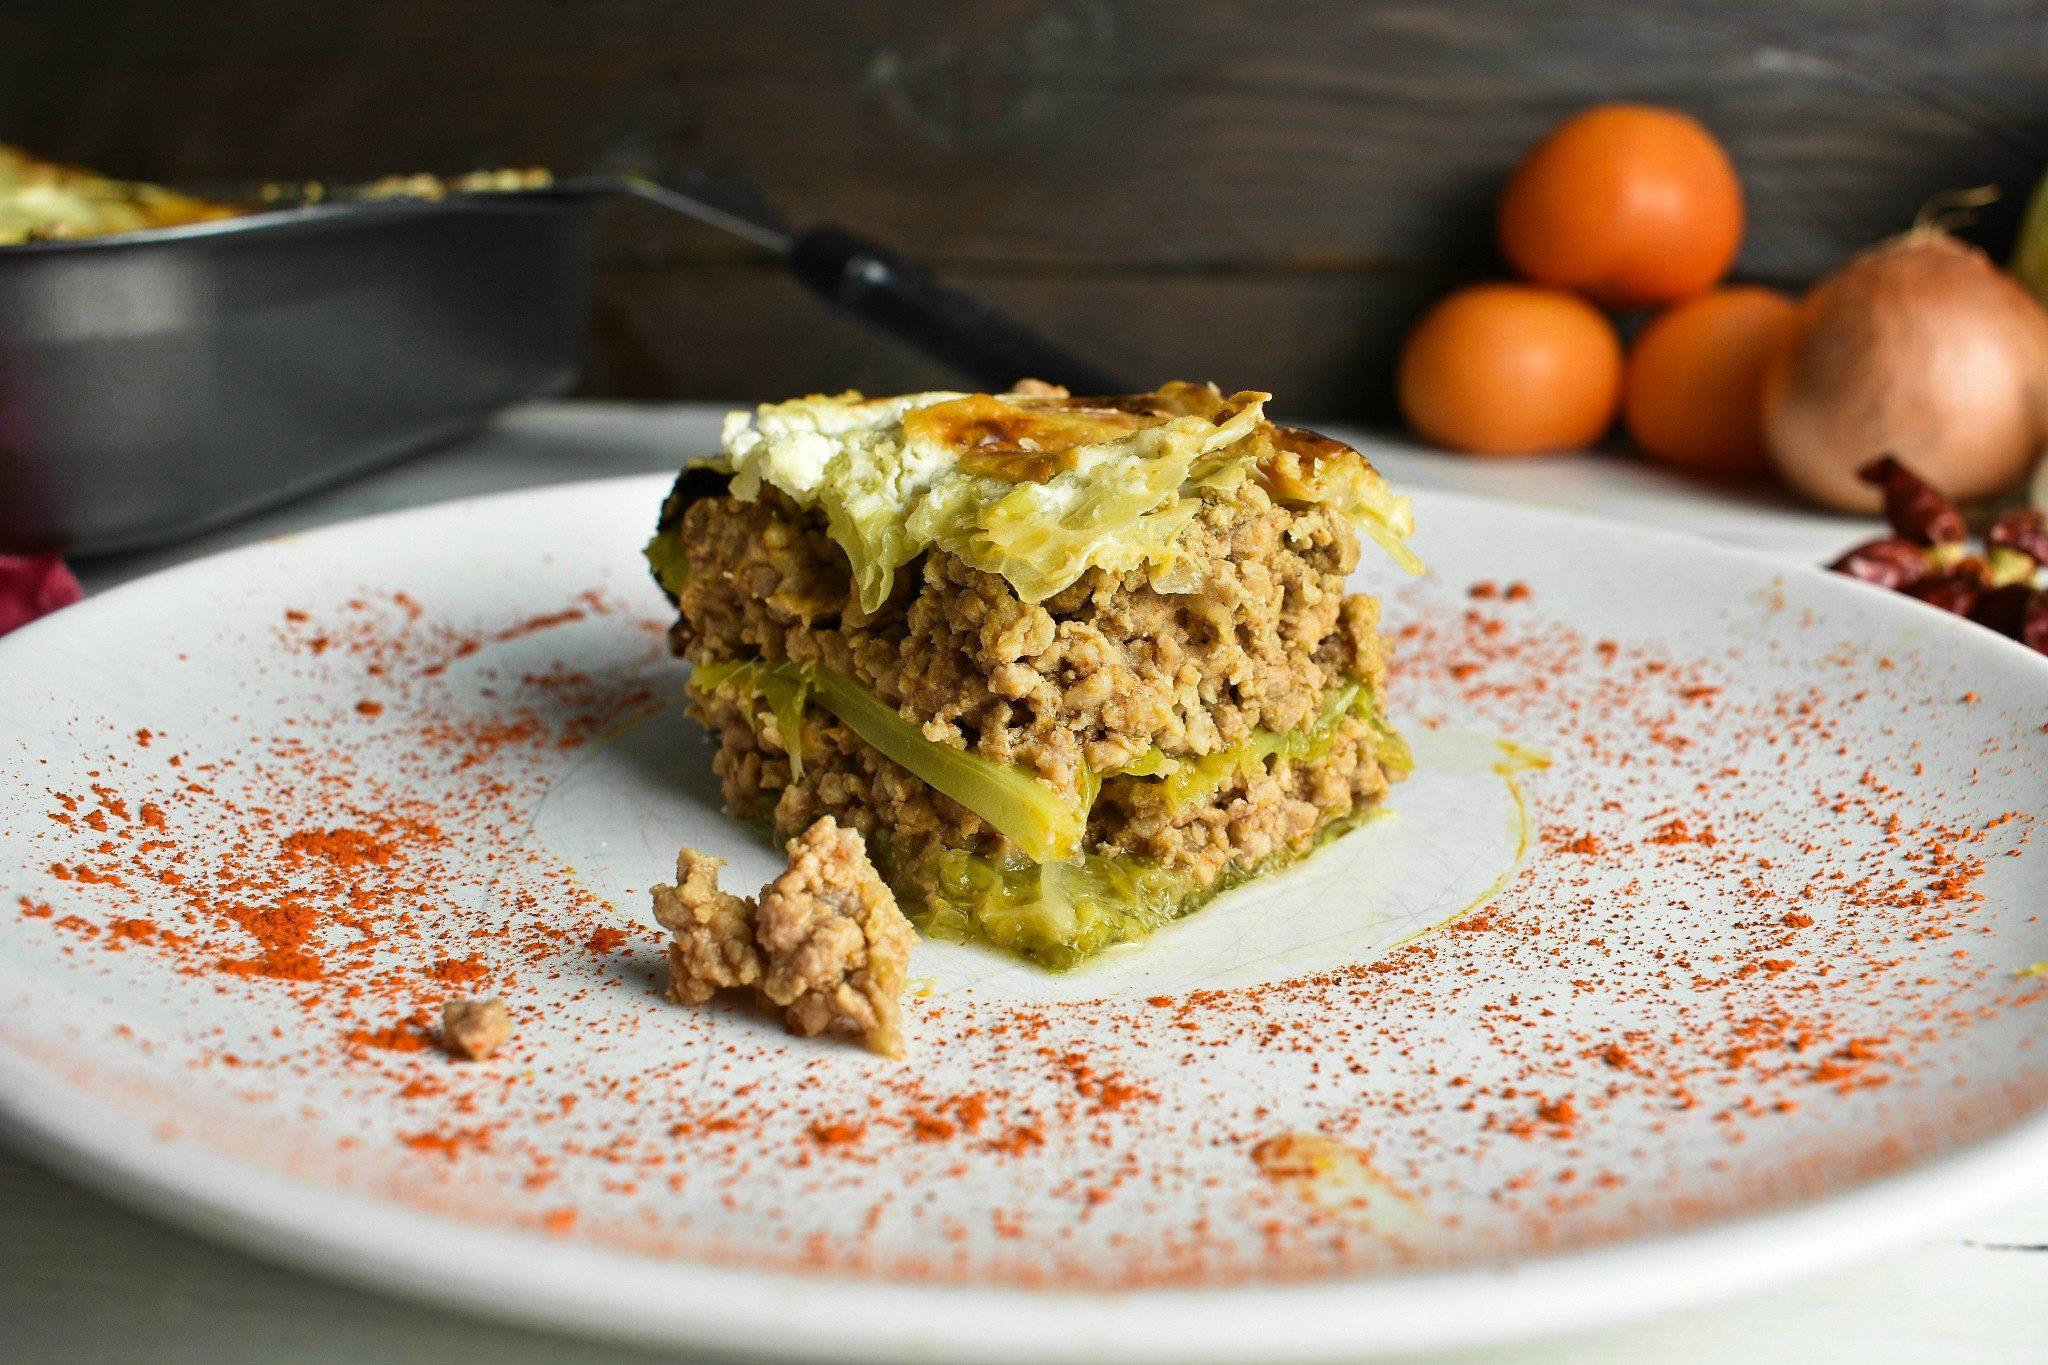 Savoy-cabbage-recipe-Gluten-free-casserole-4-SunCakeMom